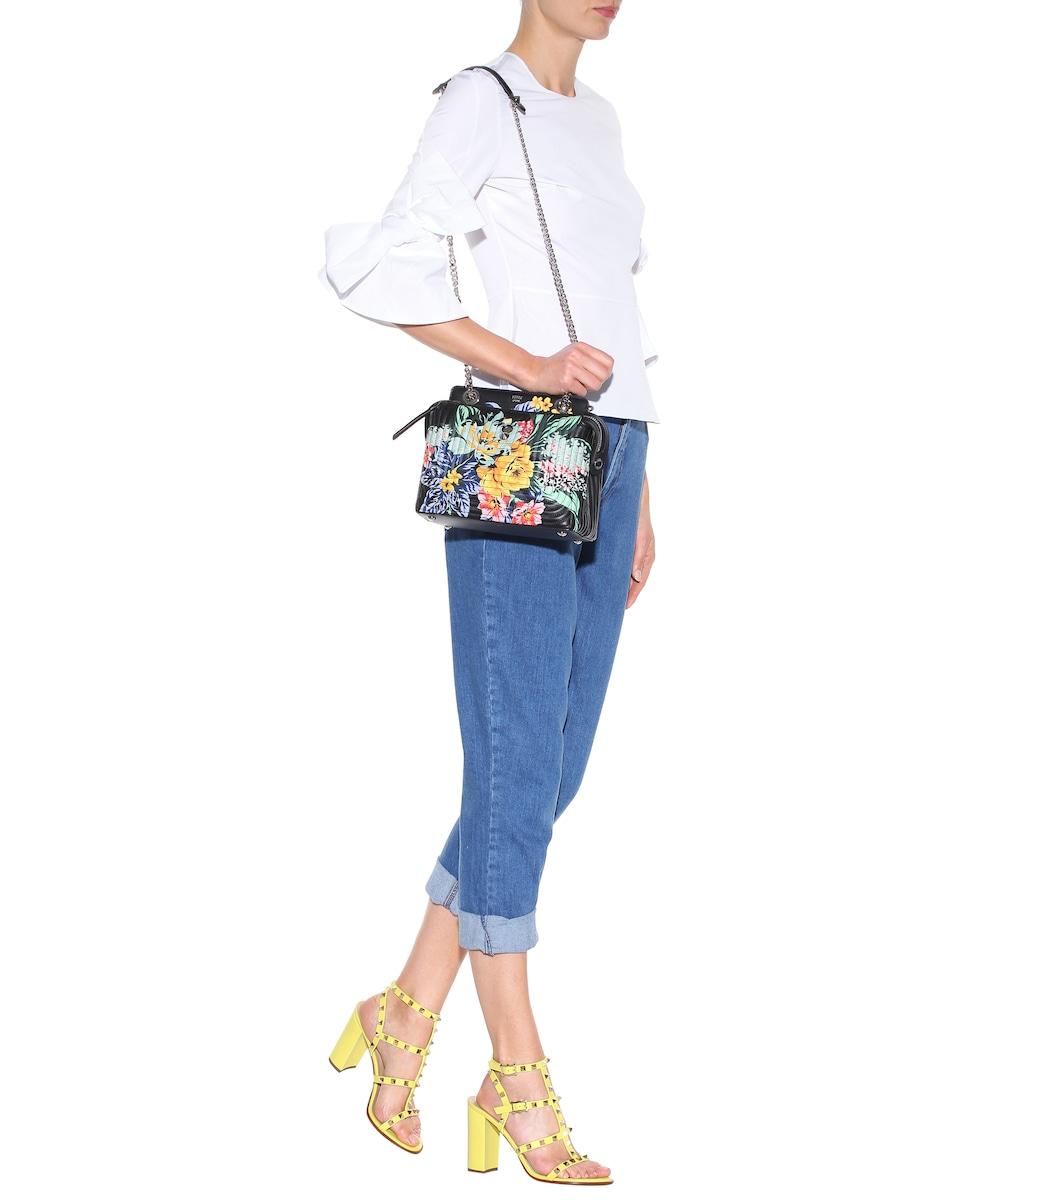 f102e32dd10 Fendi - DotCom Click printed leather shoulder bag | Mytheresa